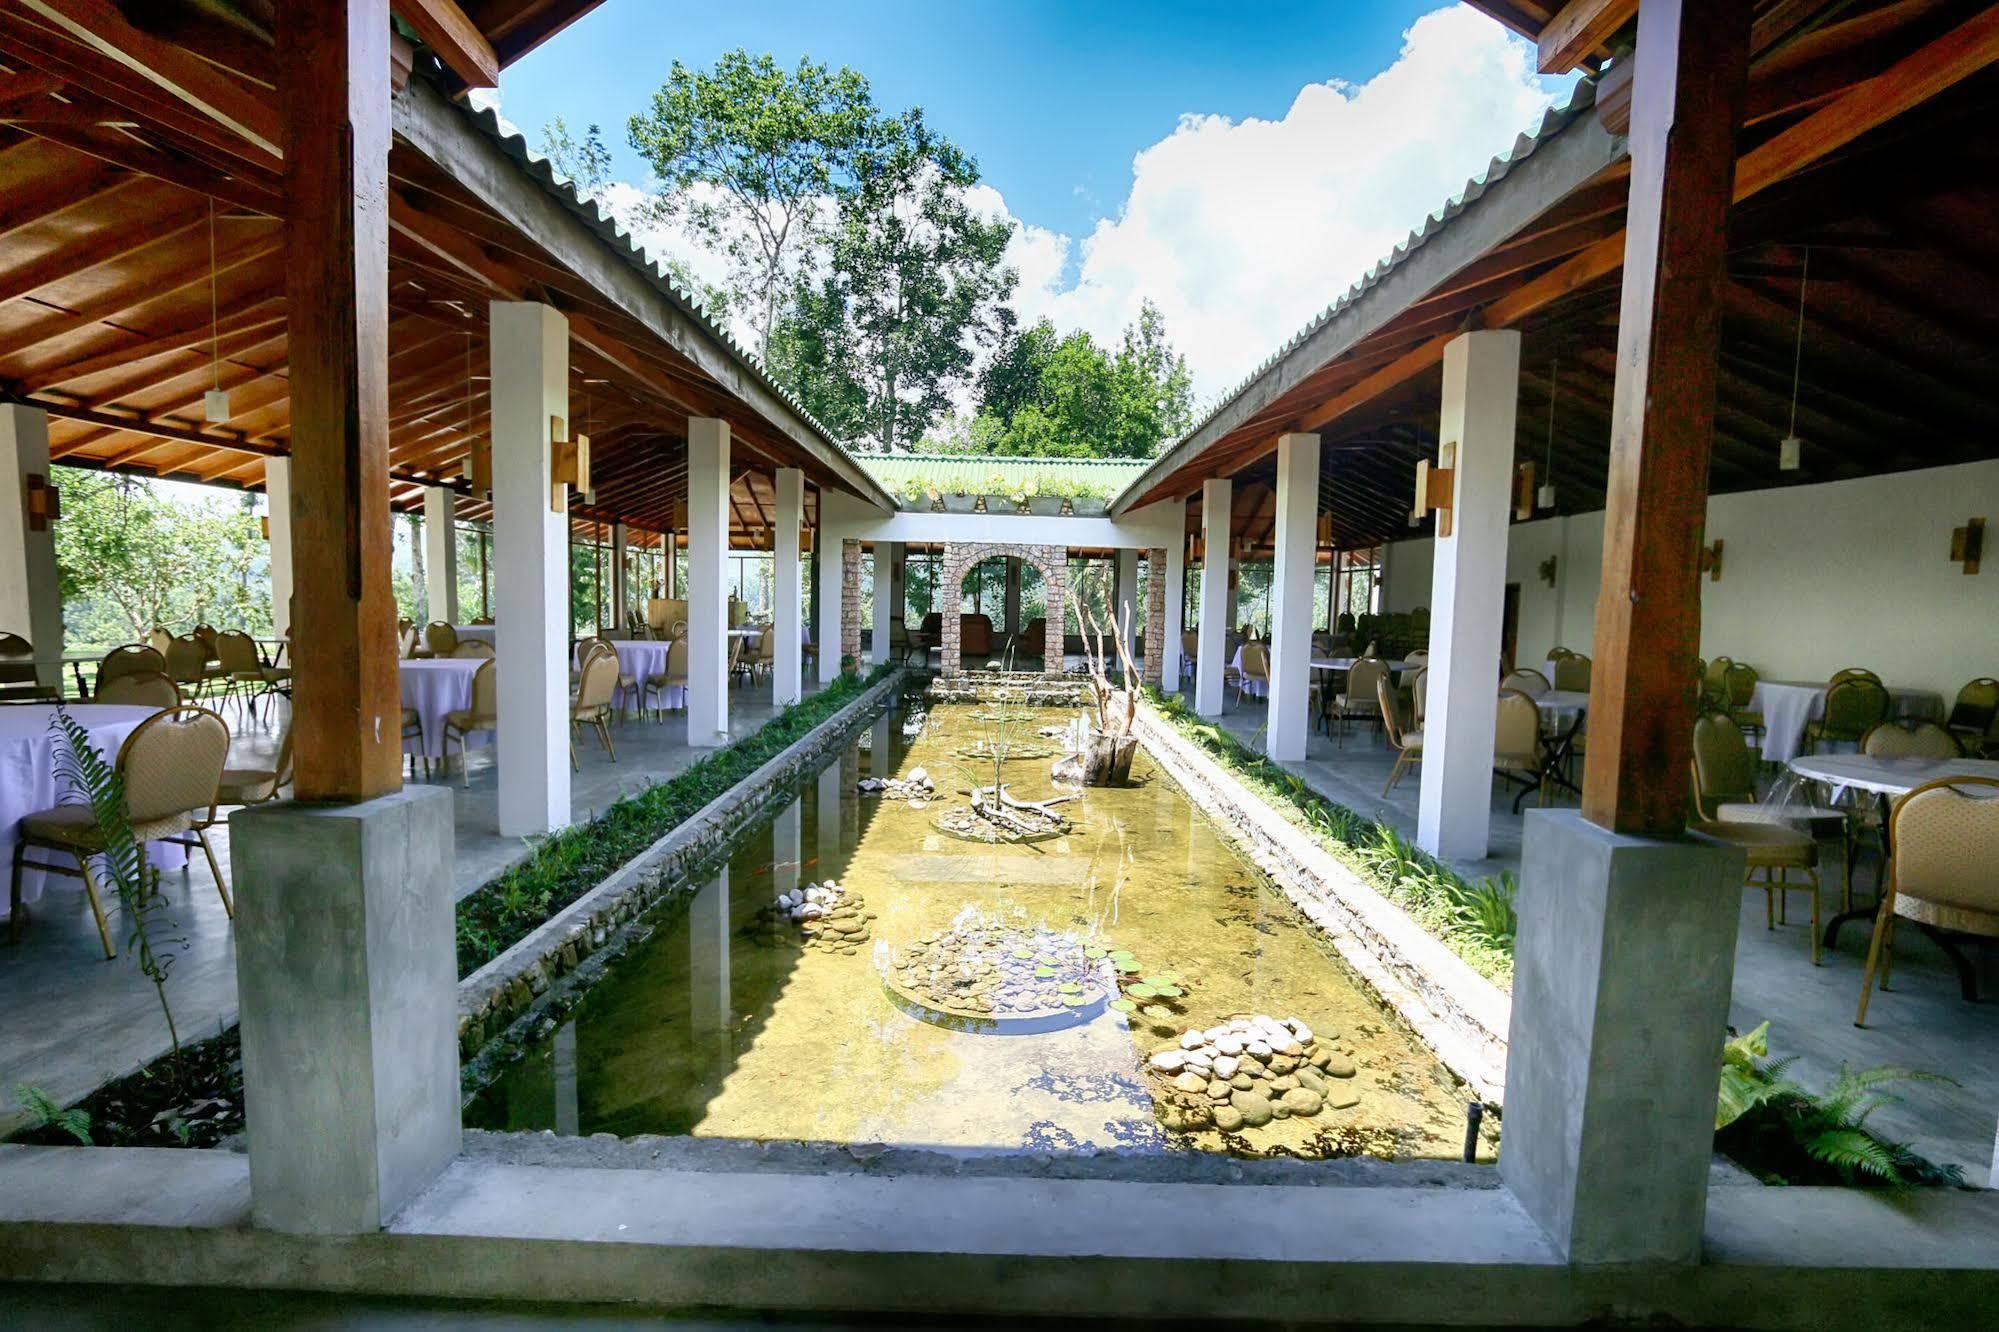 The Tea Tree Resort